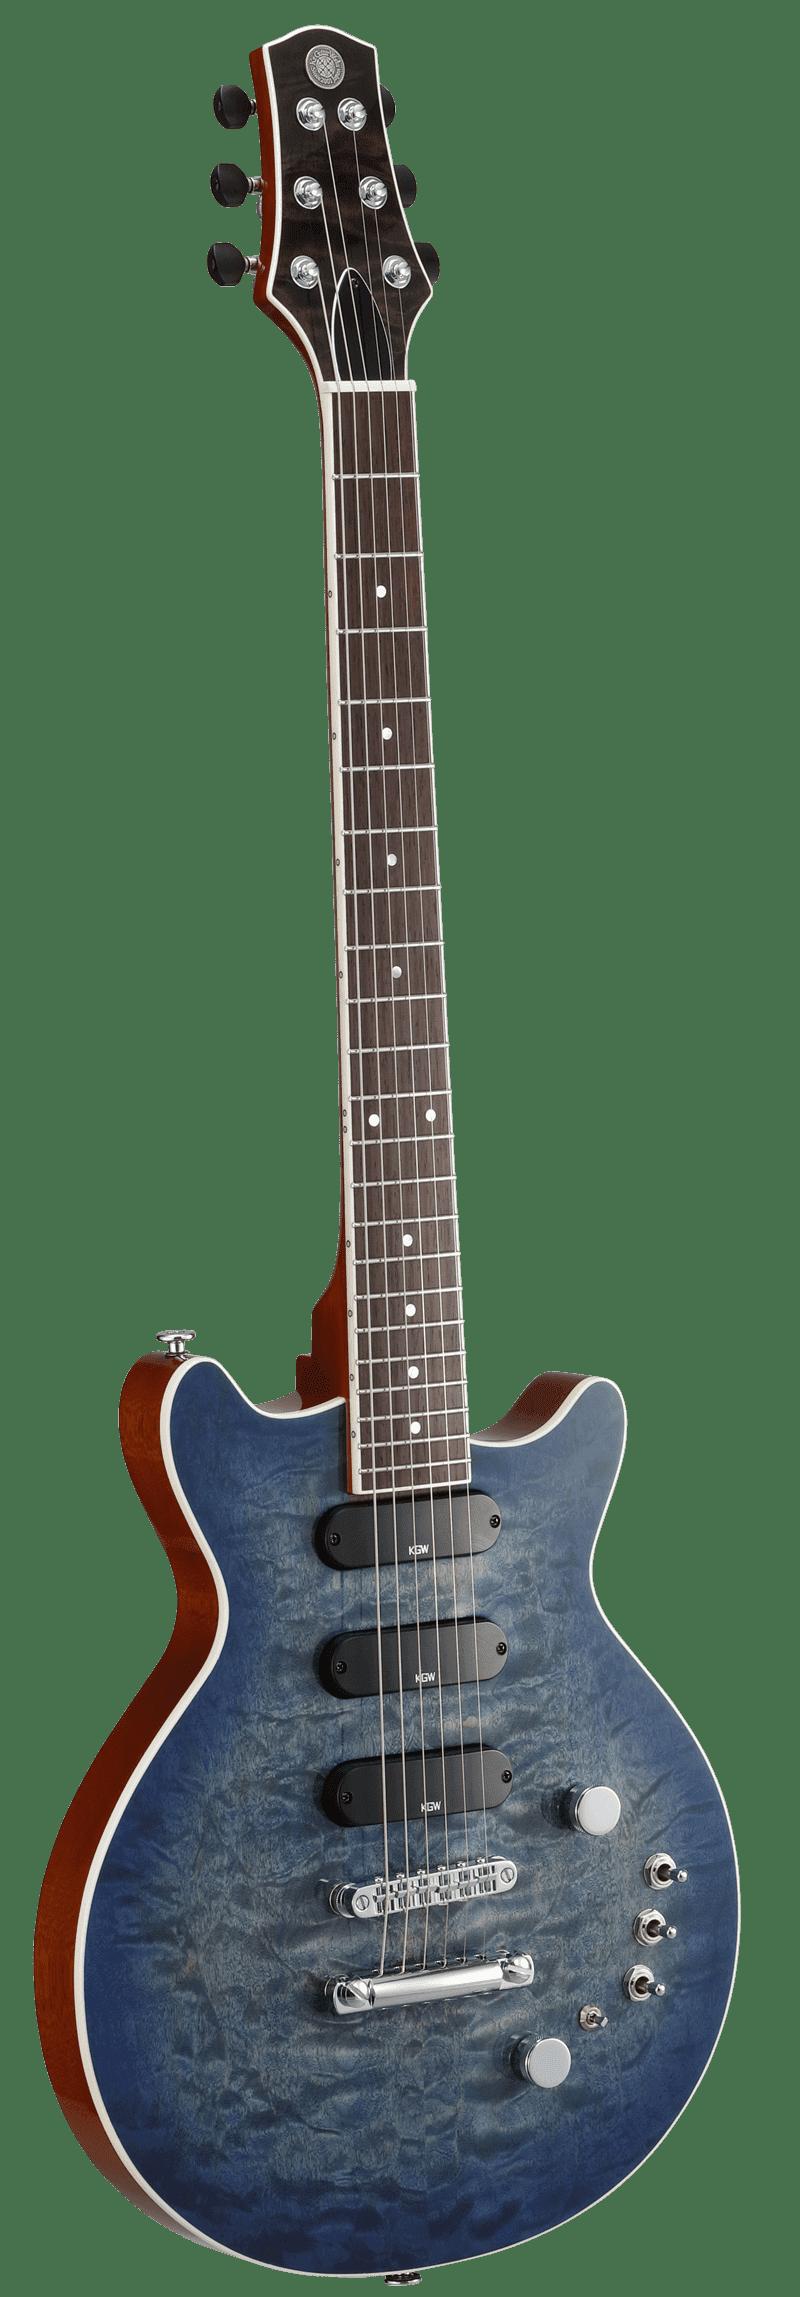 Kz Guitar Image